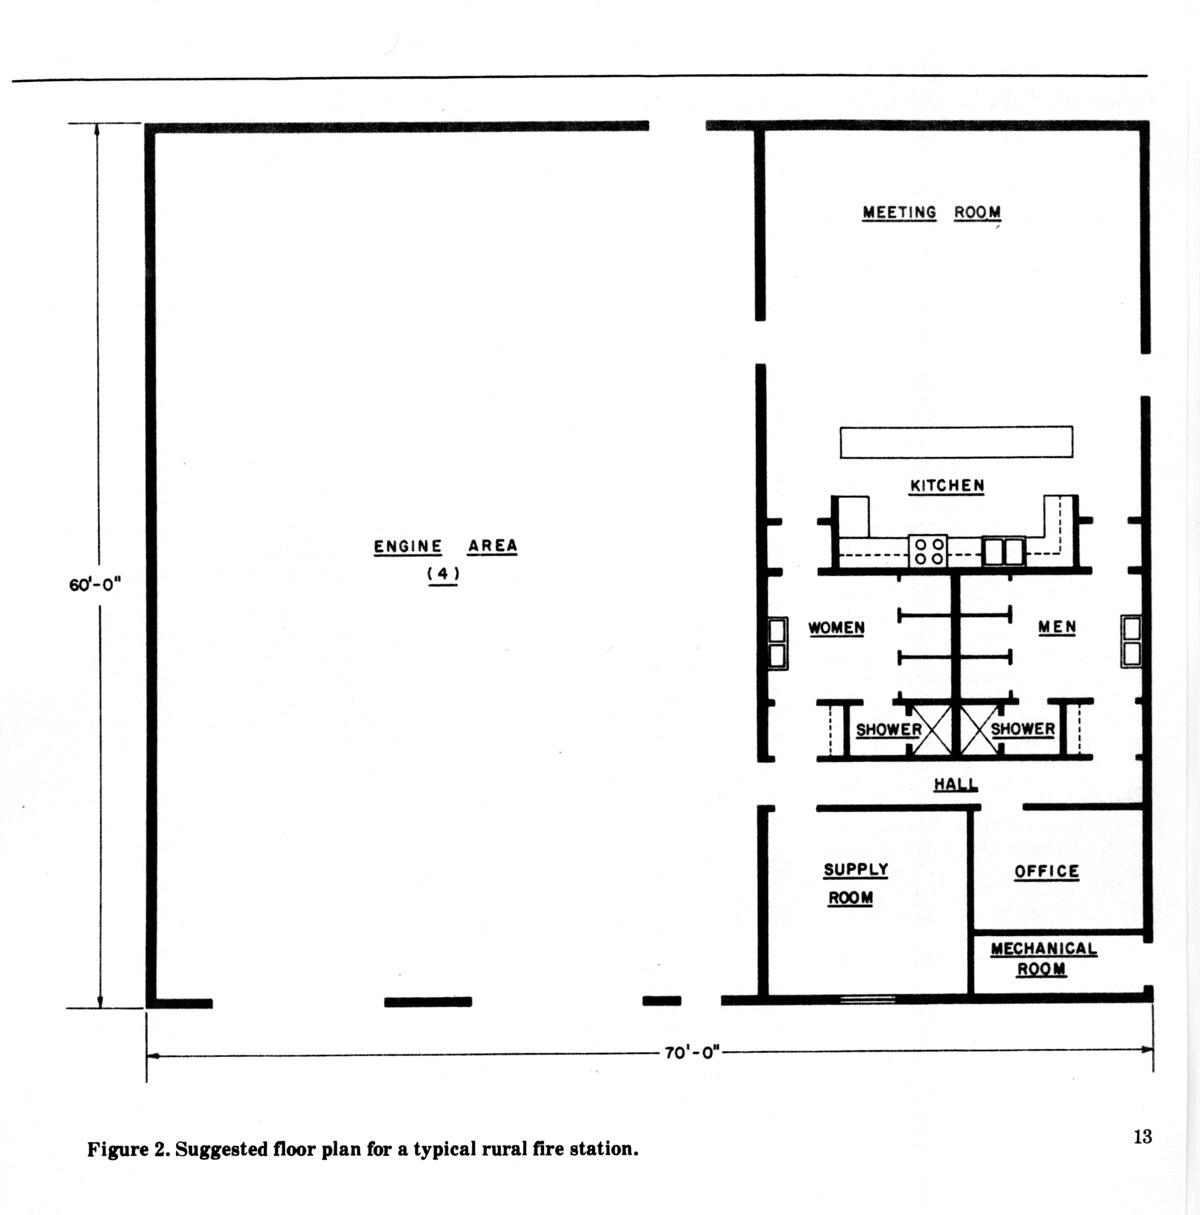 Rural fire station design 1977 legeros fire blog archives 2006 2015 for Fire station floor plans design